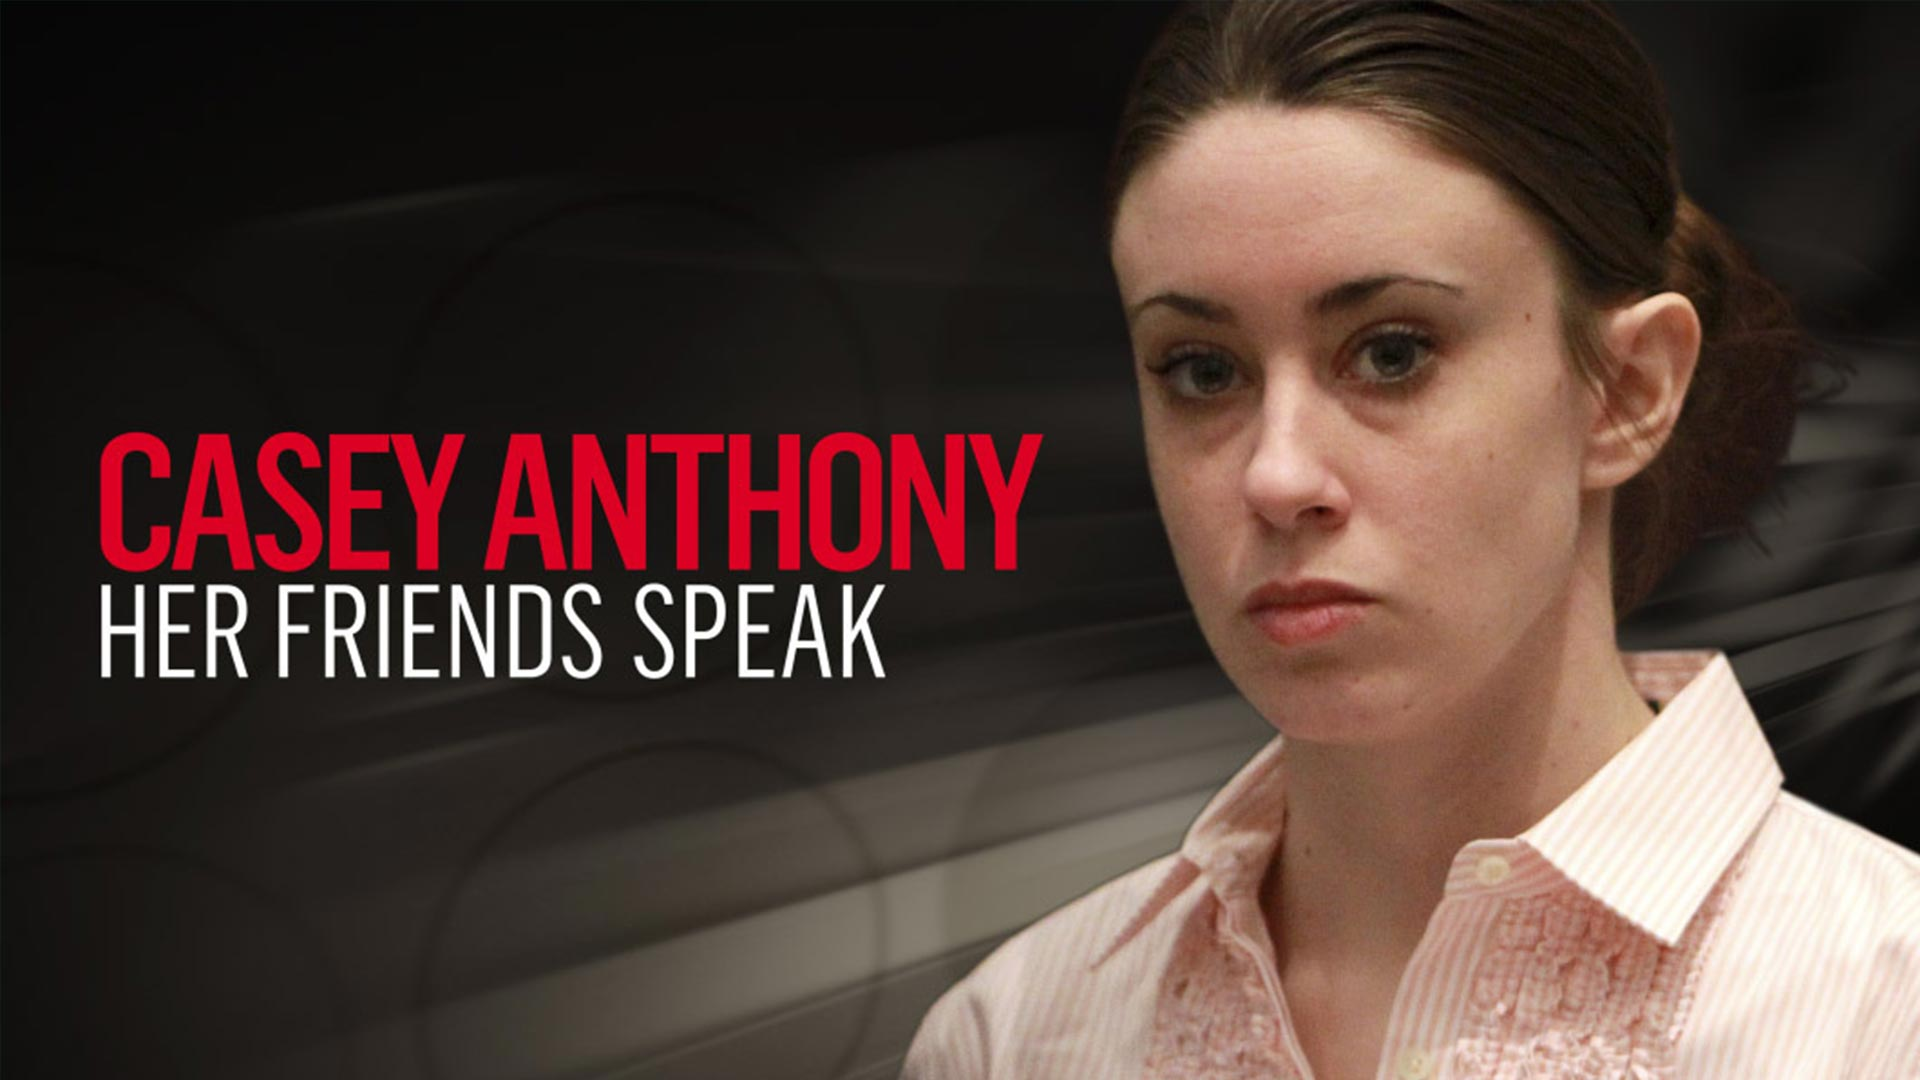 Casey Anthony: Her Friends Speak